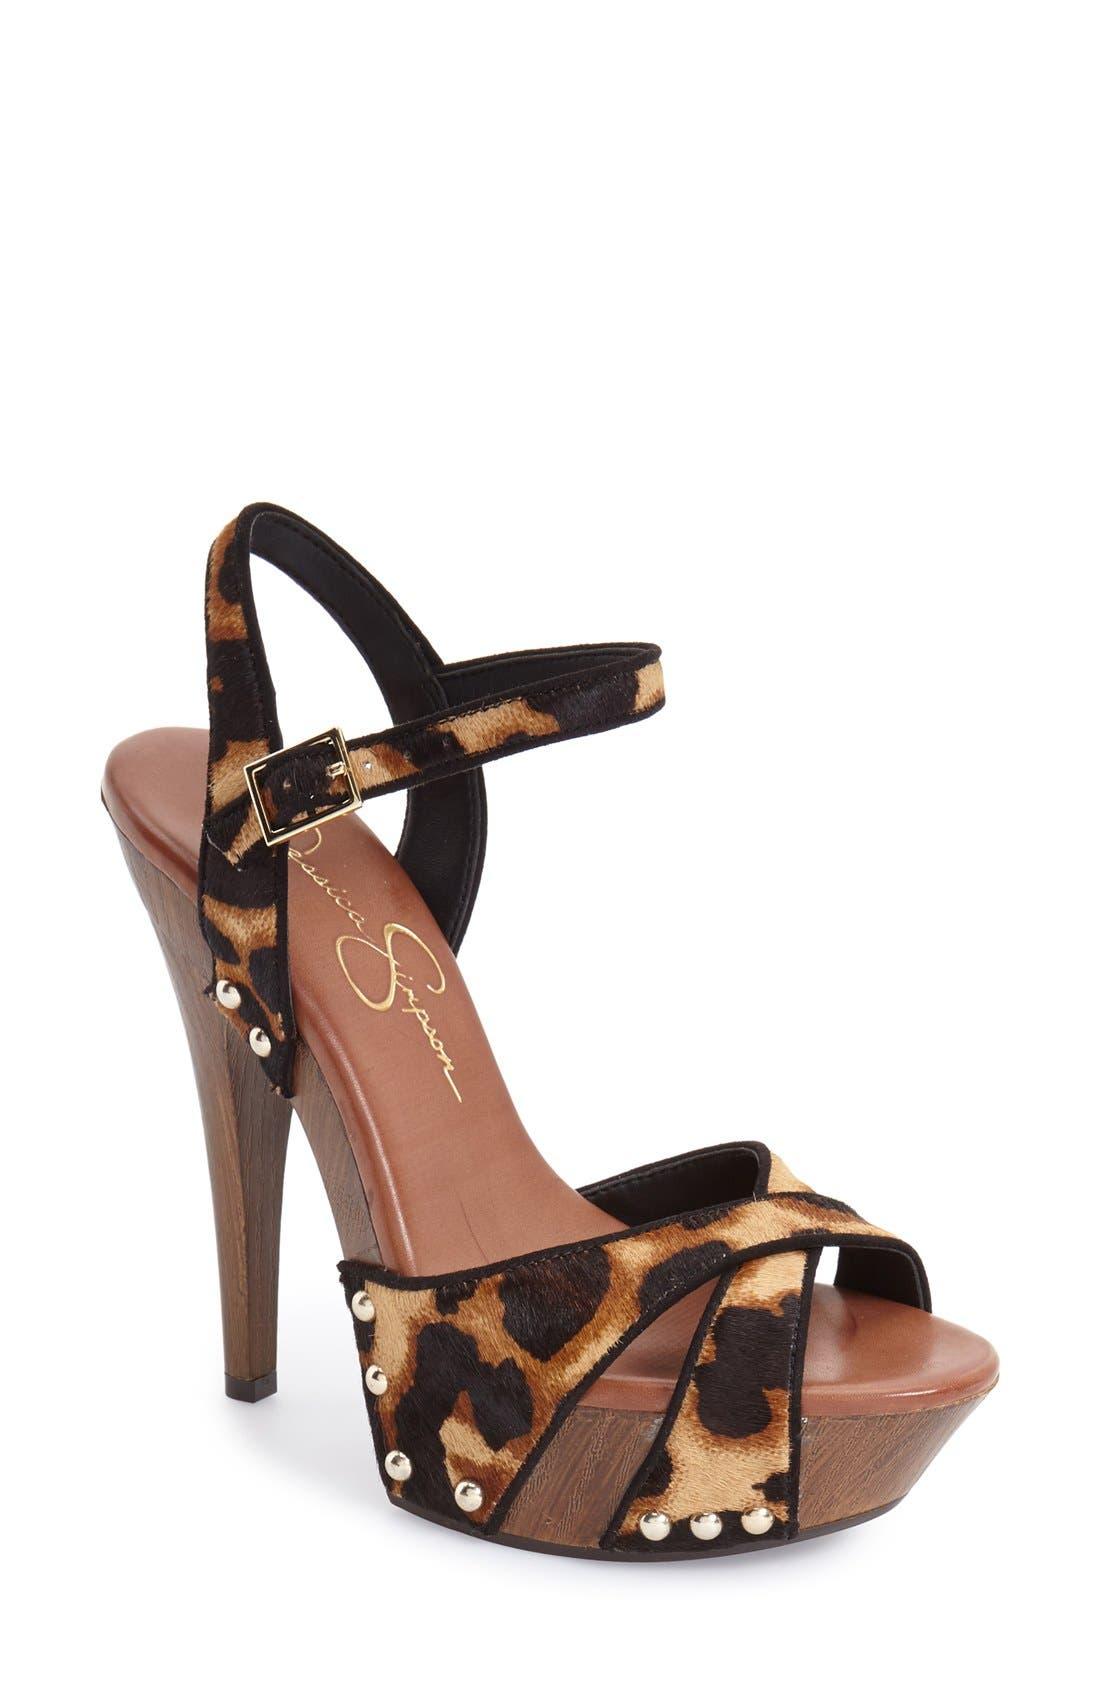 Main Image - Jessica Simpson 'Faraday' Platform Sandal (Women)